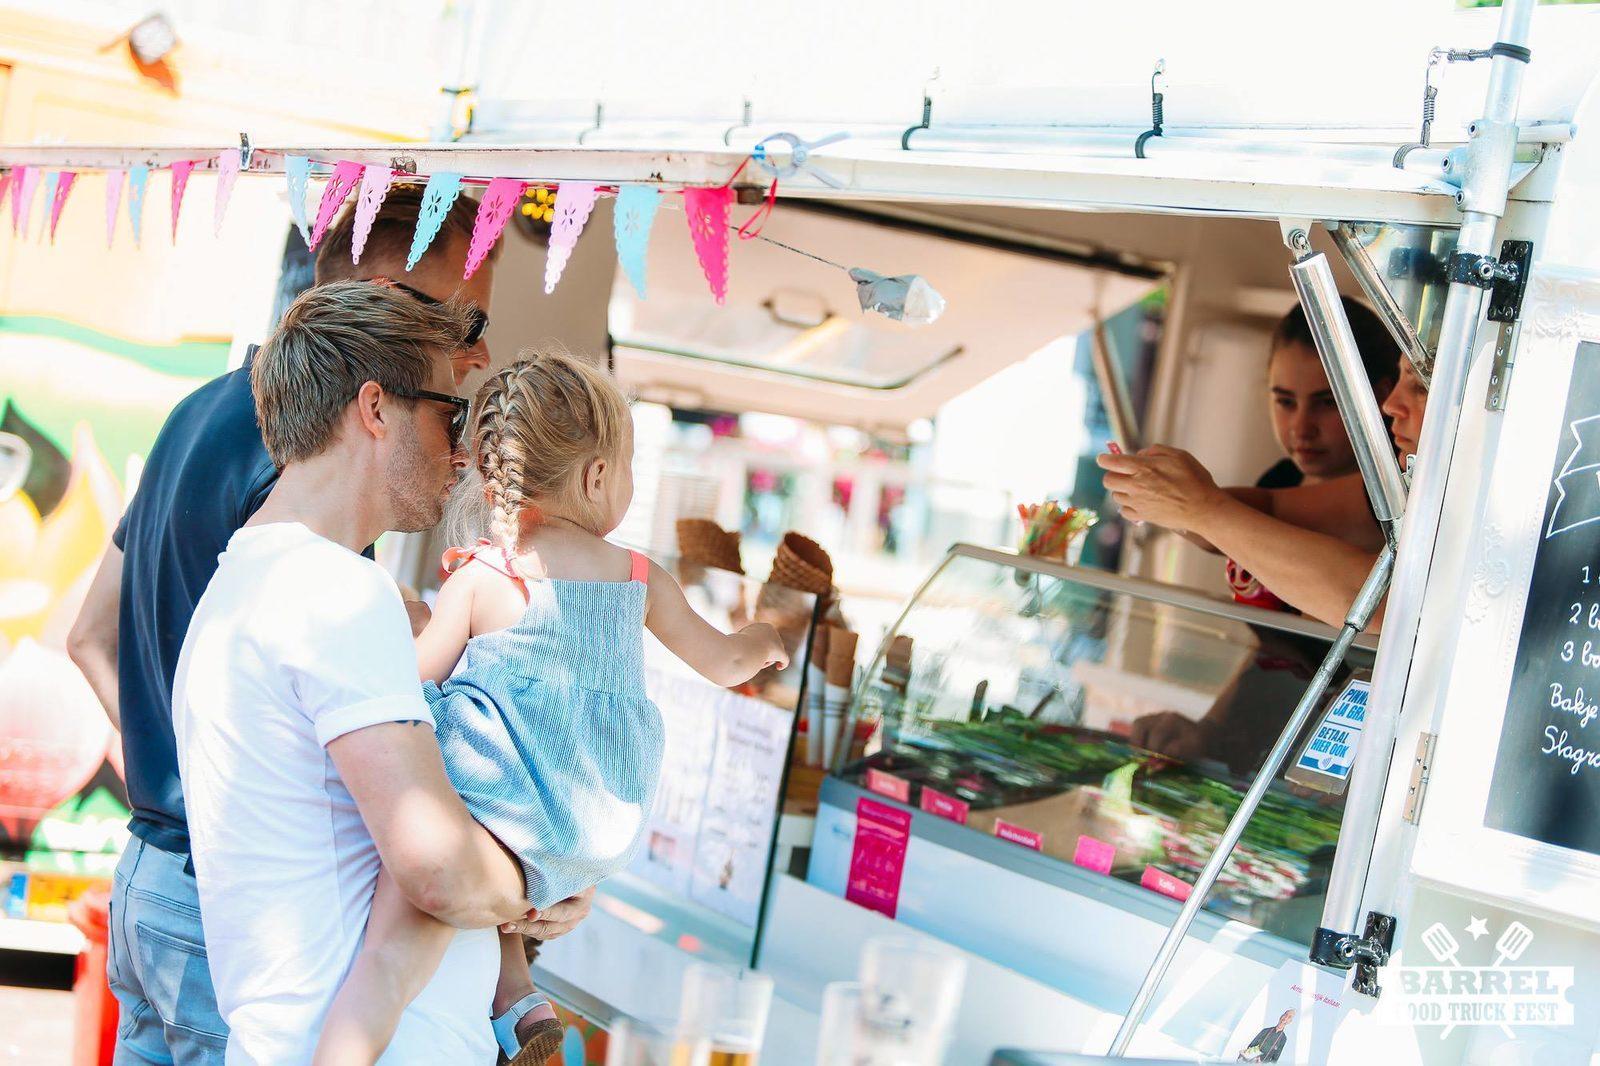 Barrel food truck festival in het centrum van Hardenberg